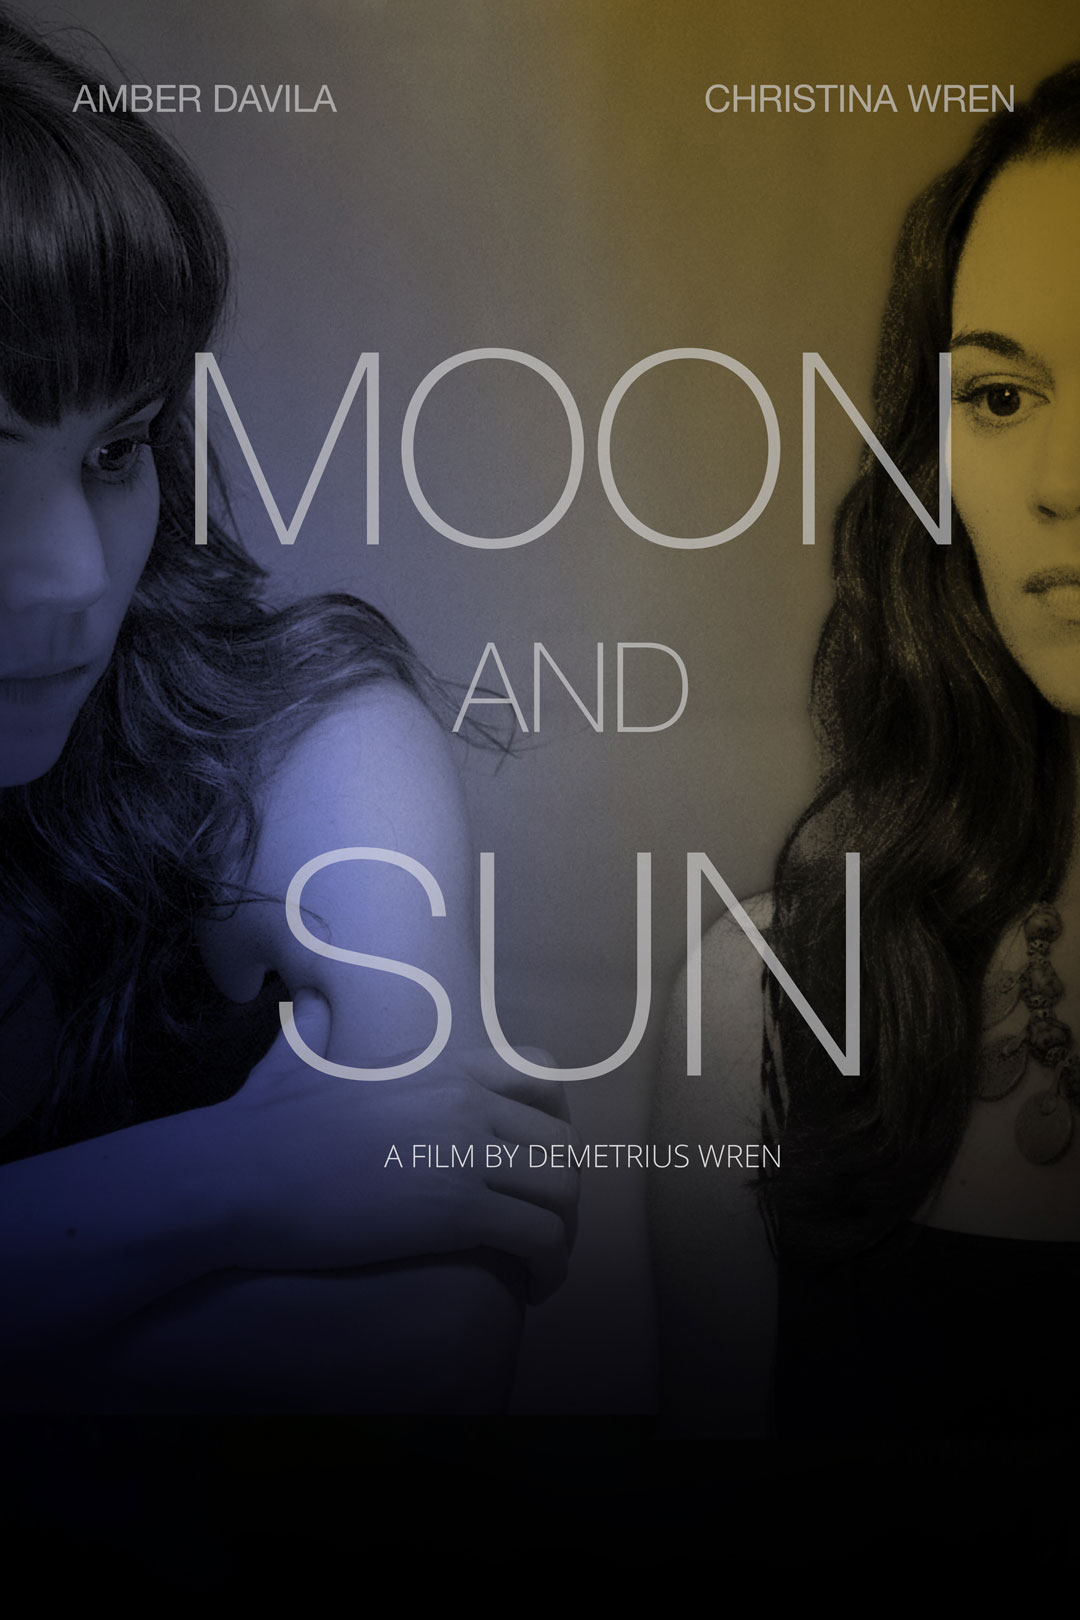 Moon-and-Sun-Poster-May-2014-Option-01.jpg